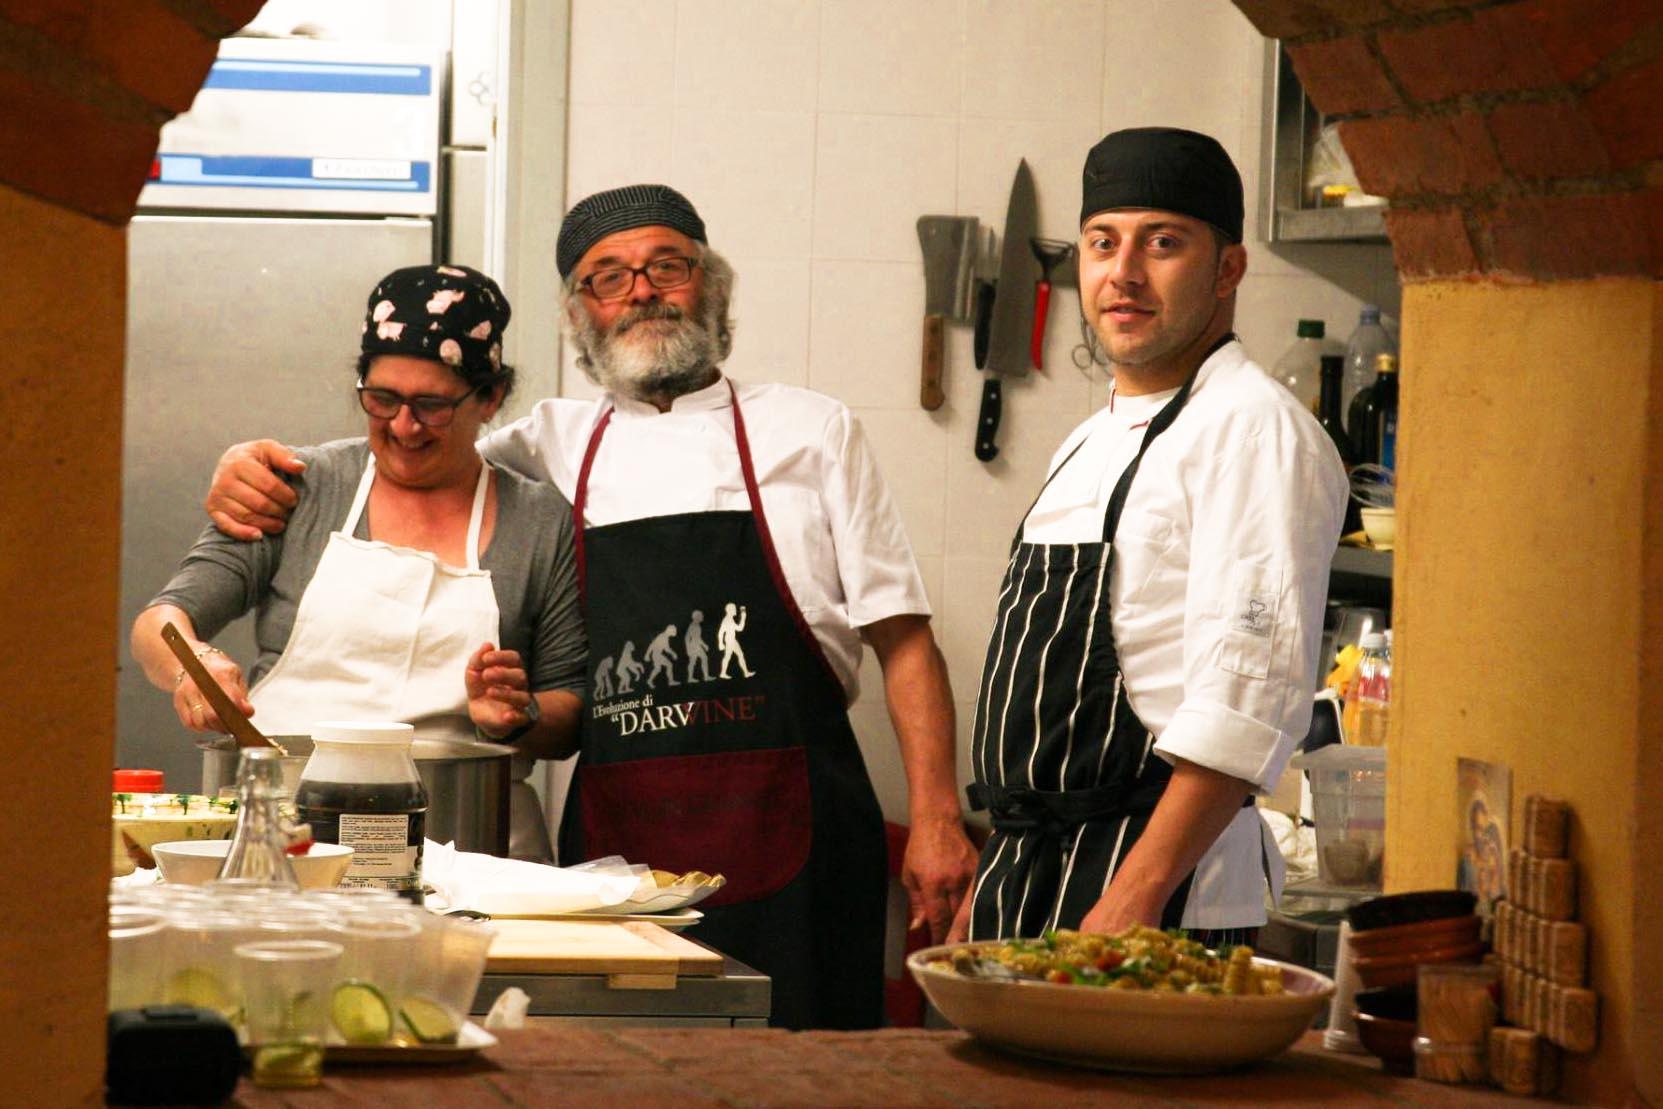 locanda-del-tartufaio - best restaurants in Chianti Siena Tuscany